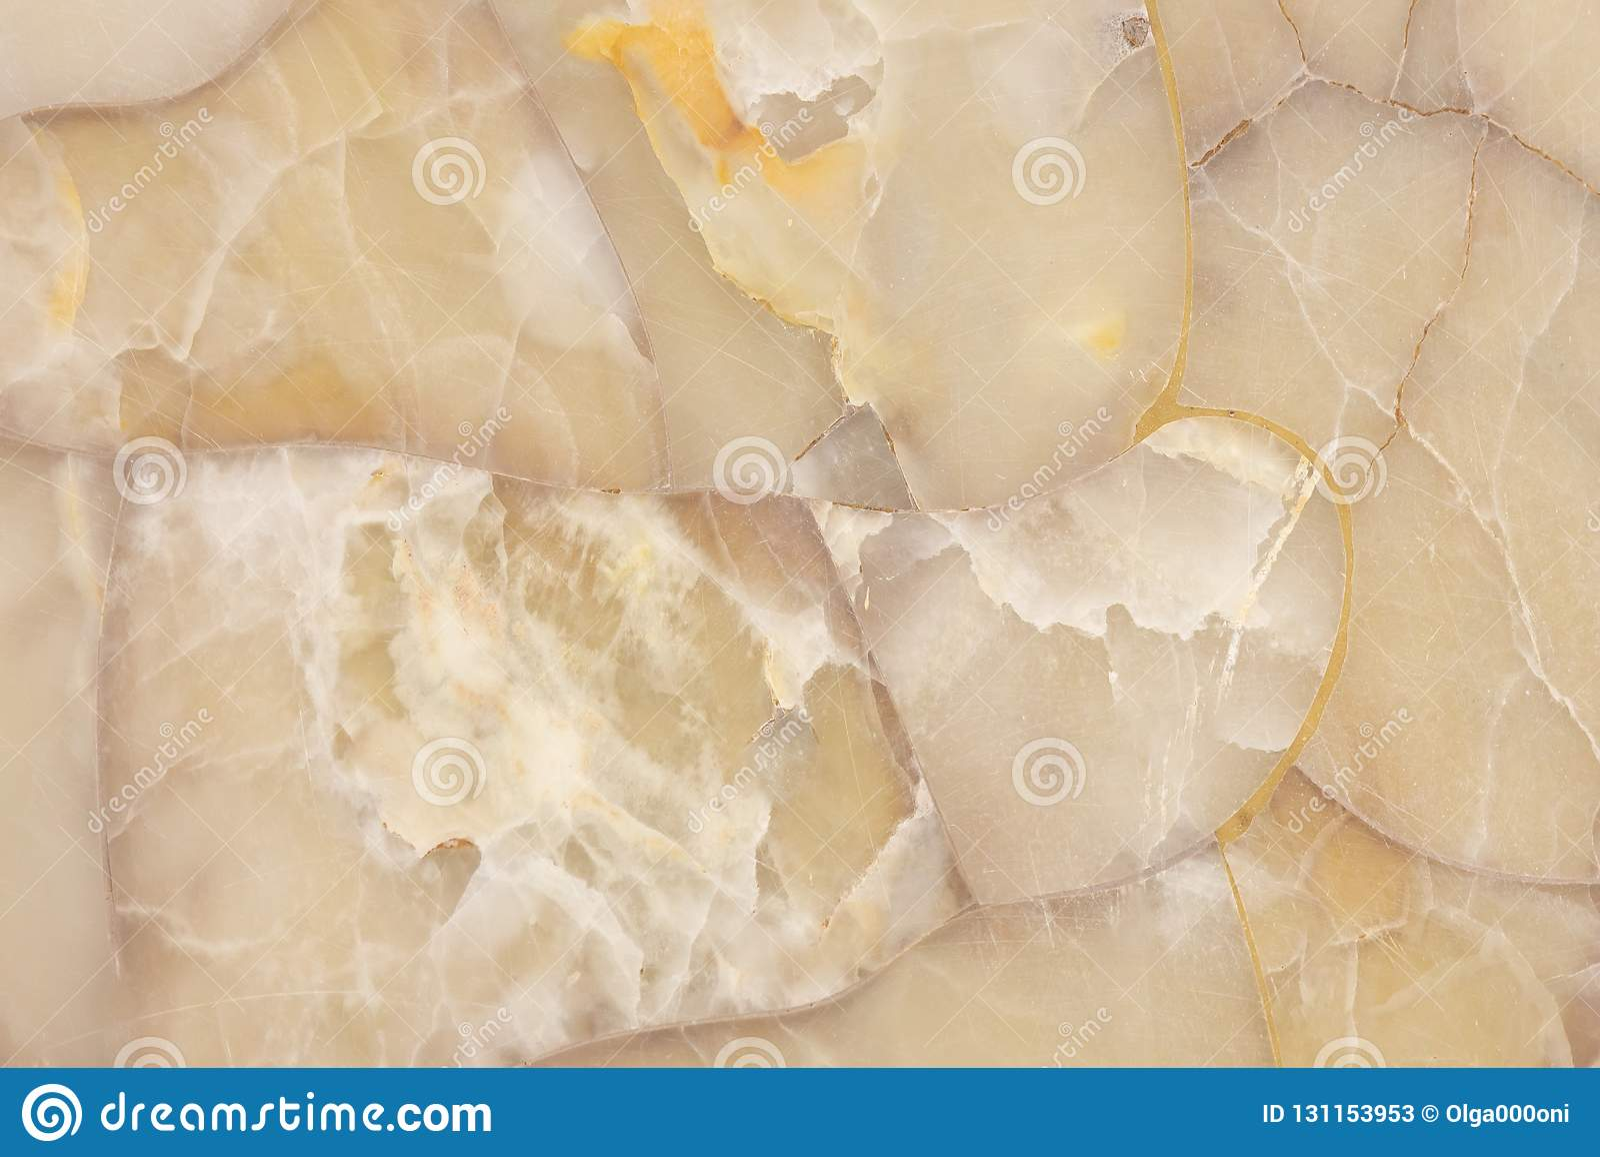 Agate Gemstone Shining Translucent Texture, Gem Quartz Honey Light